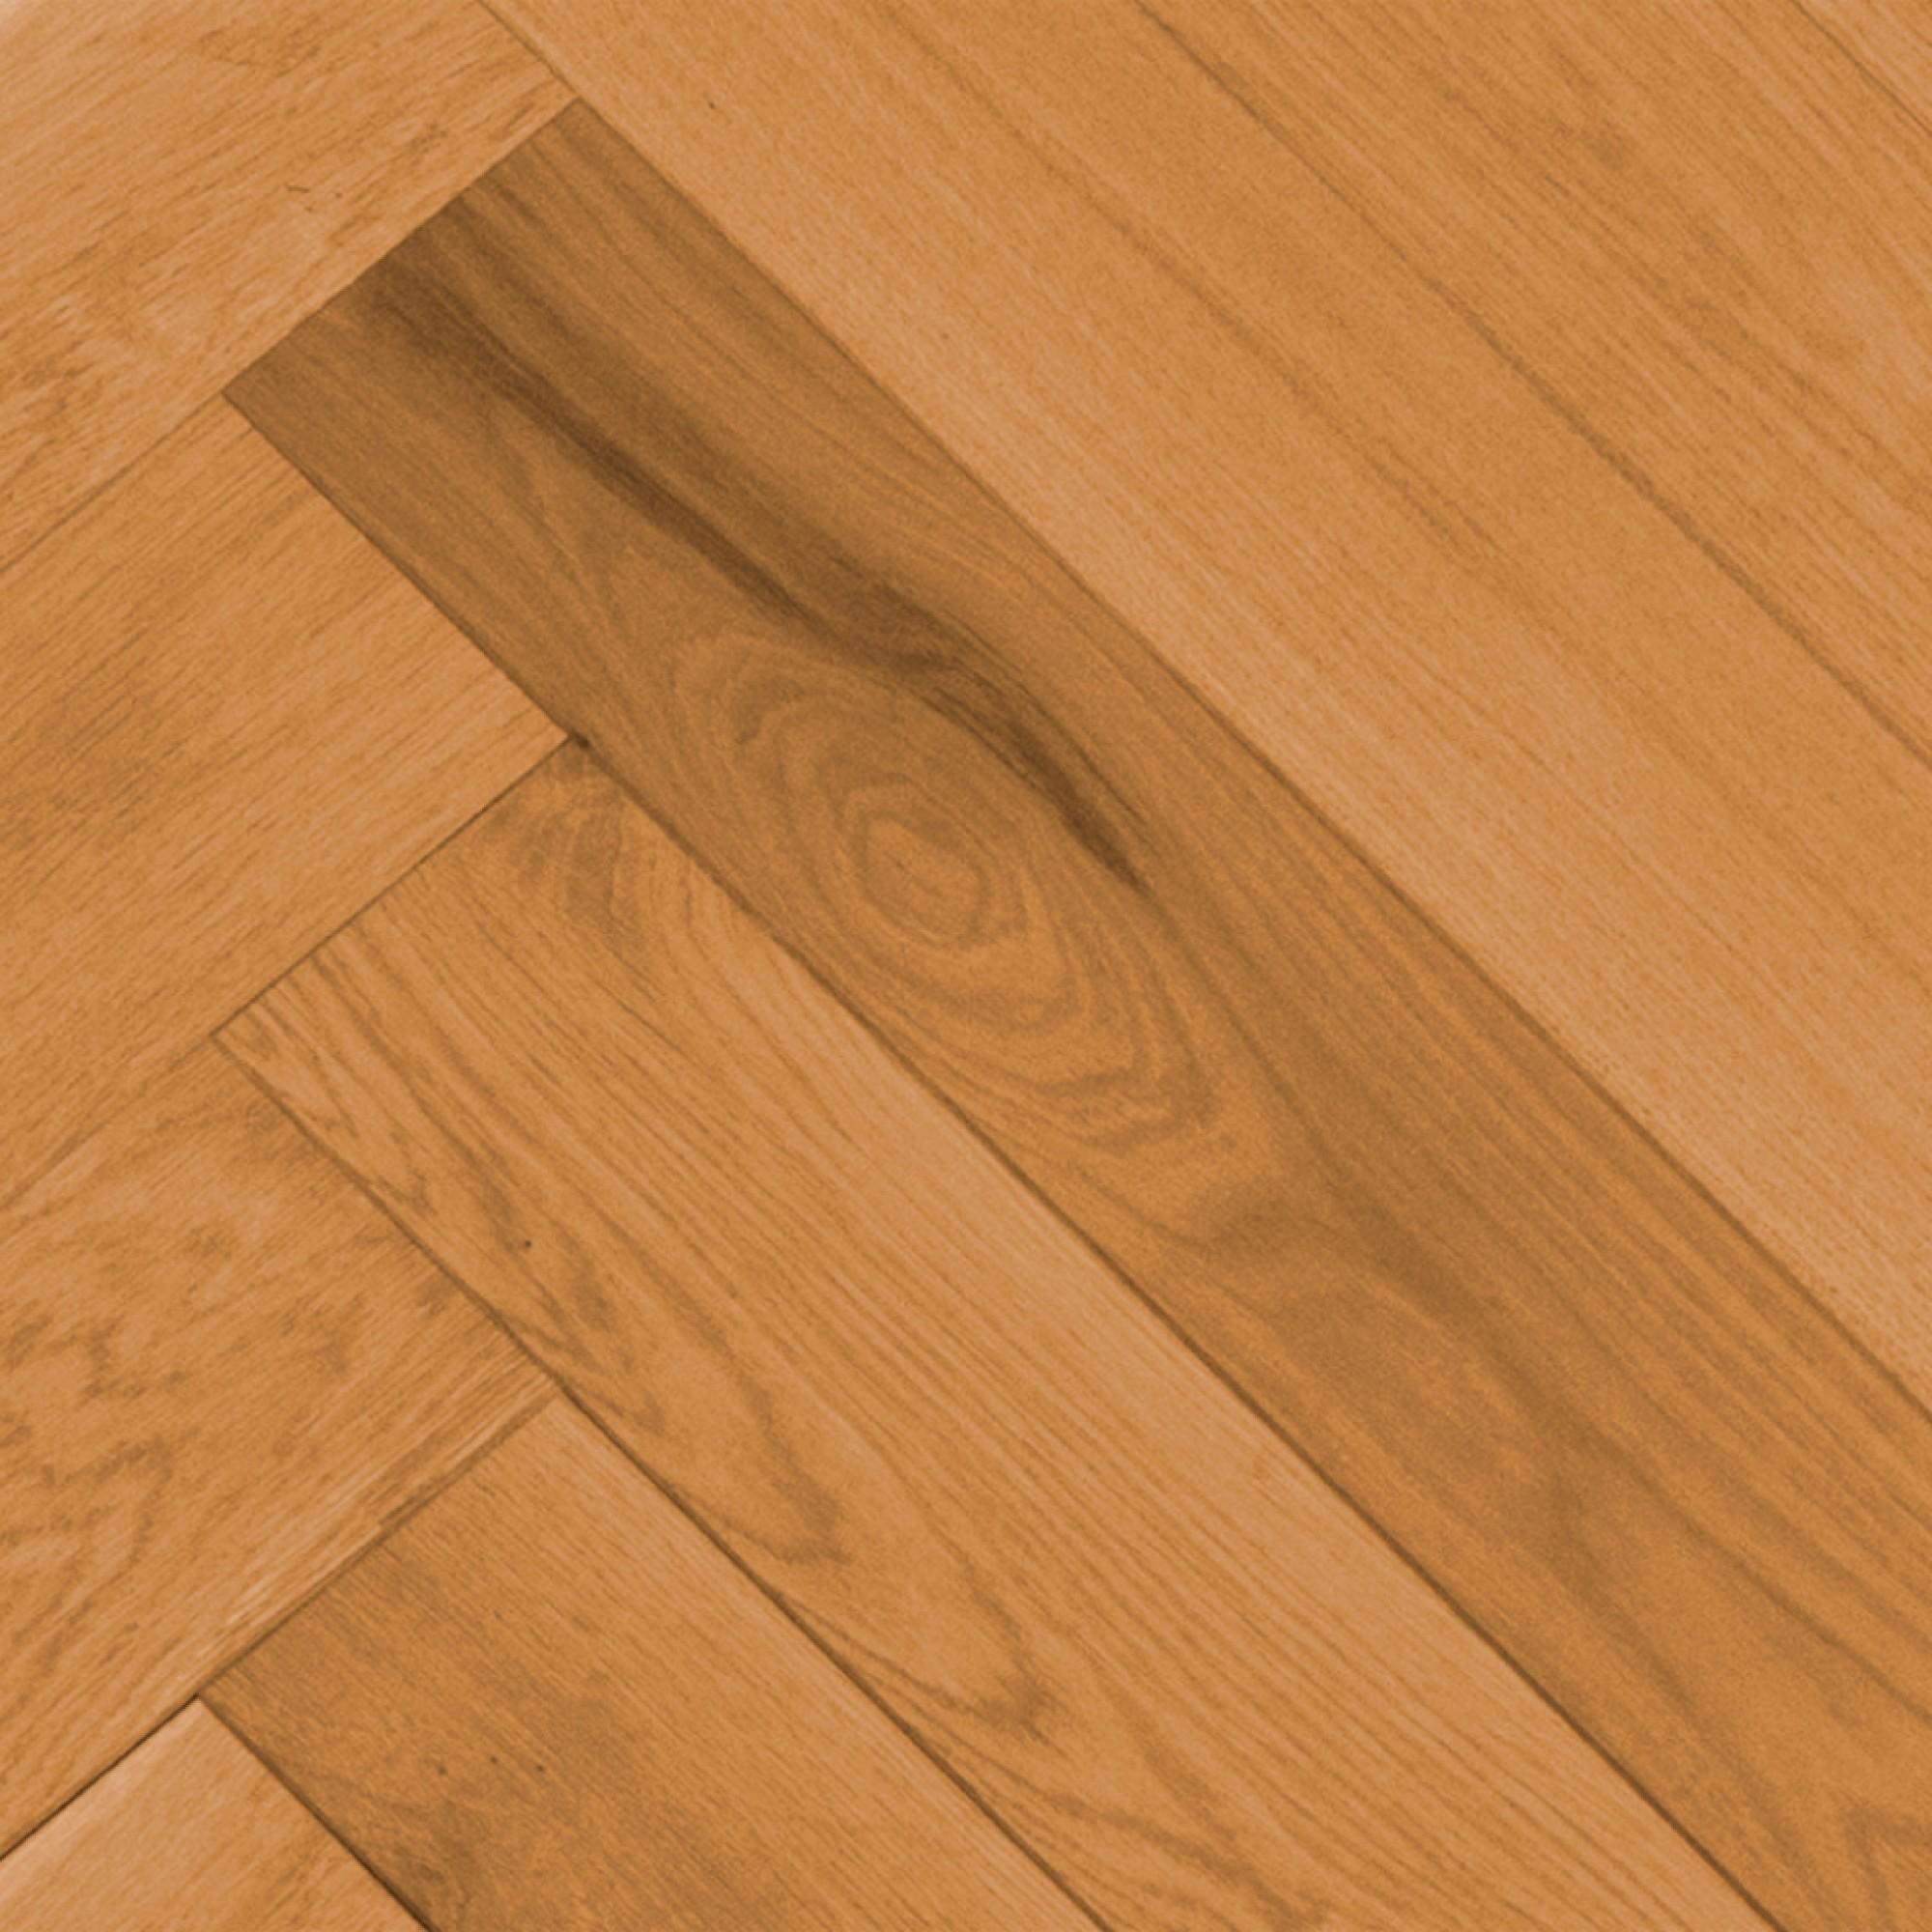 Herringbone white oak natural hand scraped vintage for White oak hardwood flooring